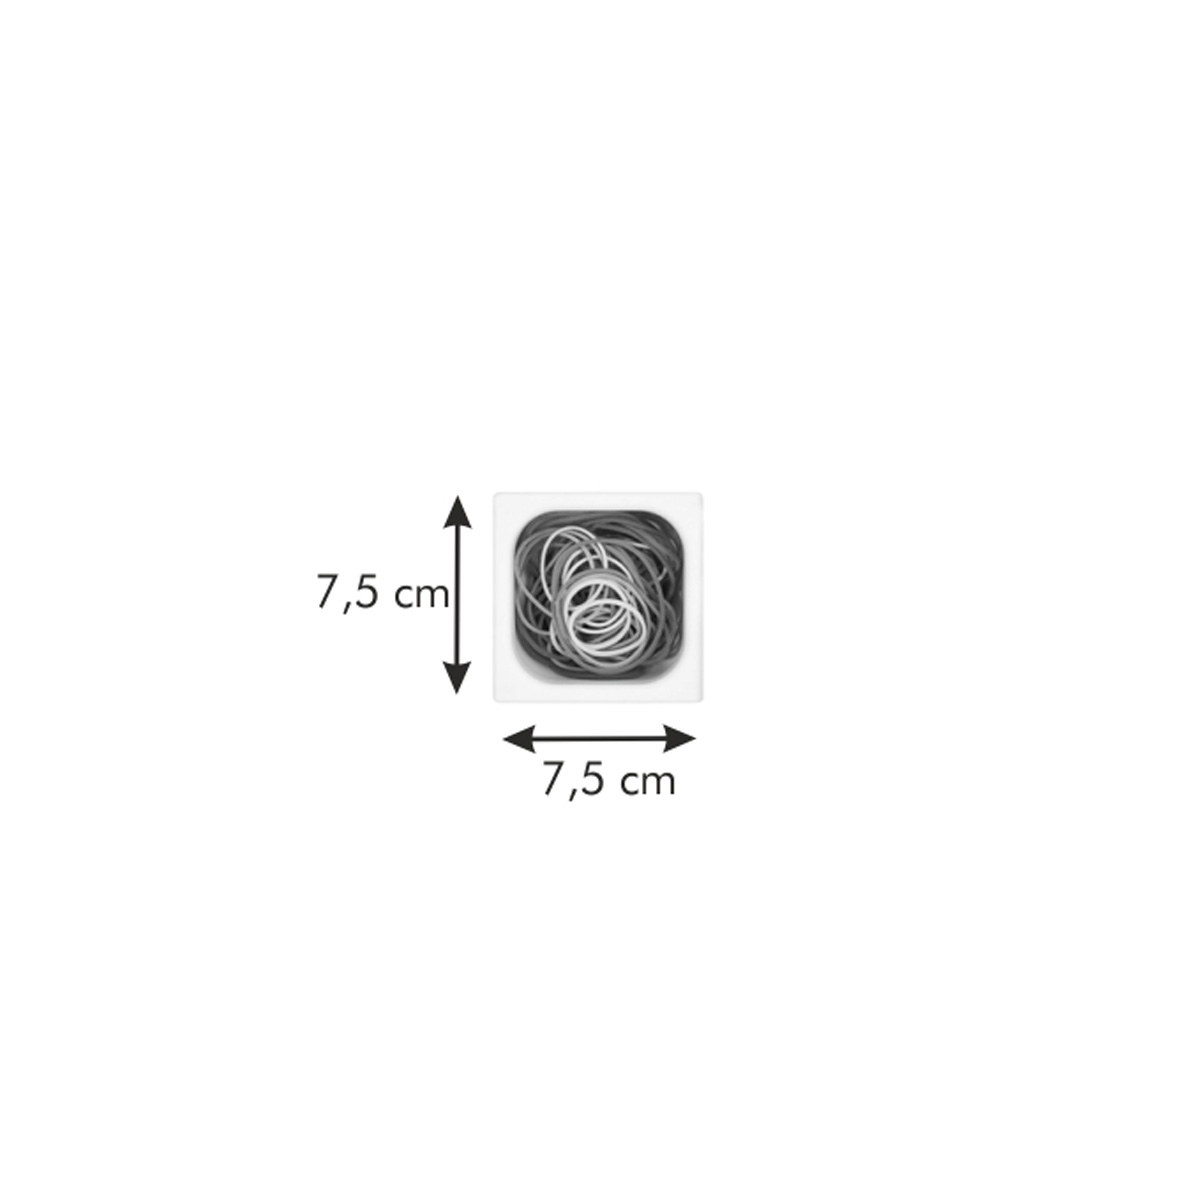 Zásobník FlexiSPACE 74x74 mm